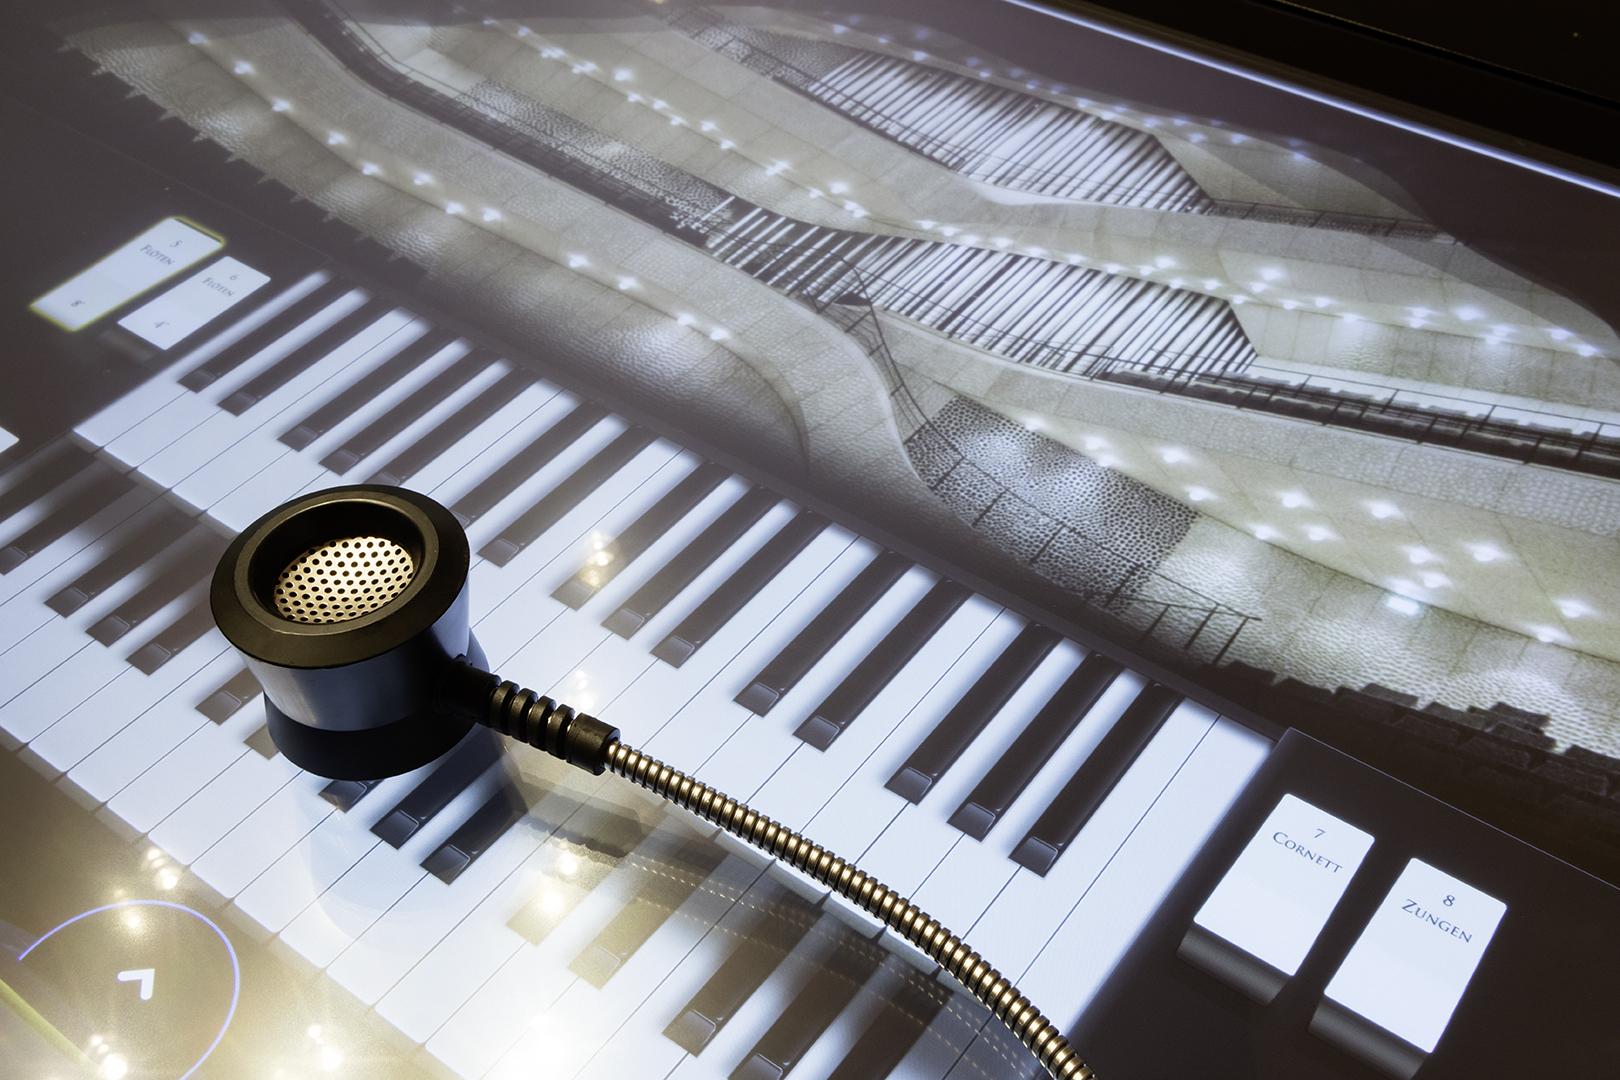 Interaktive Orgel